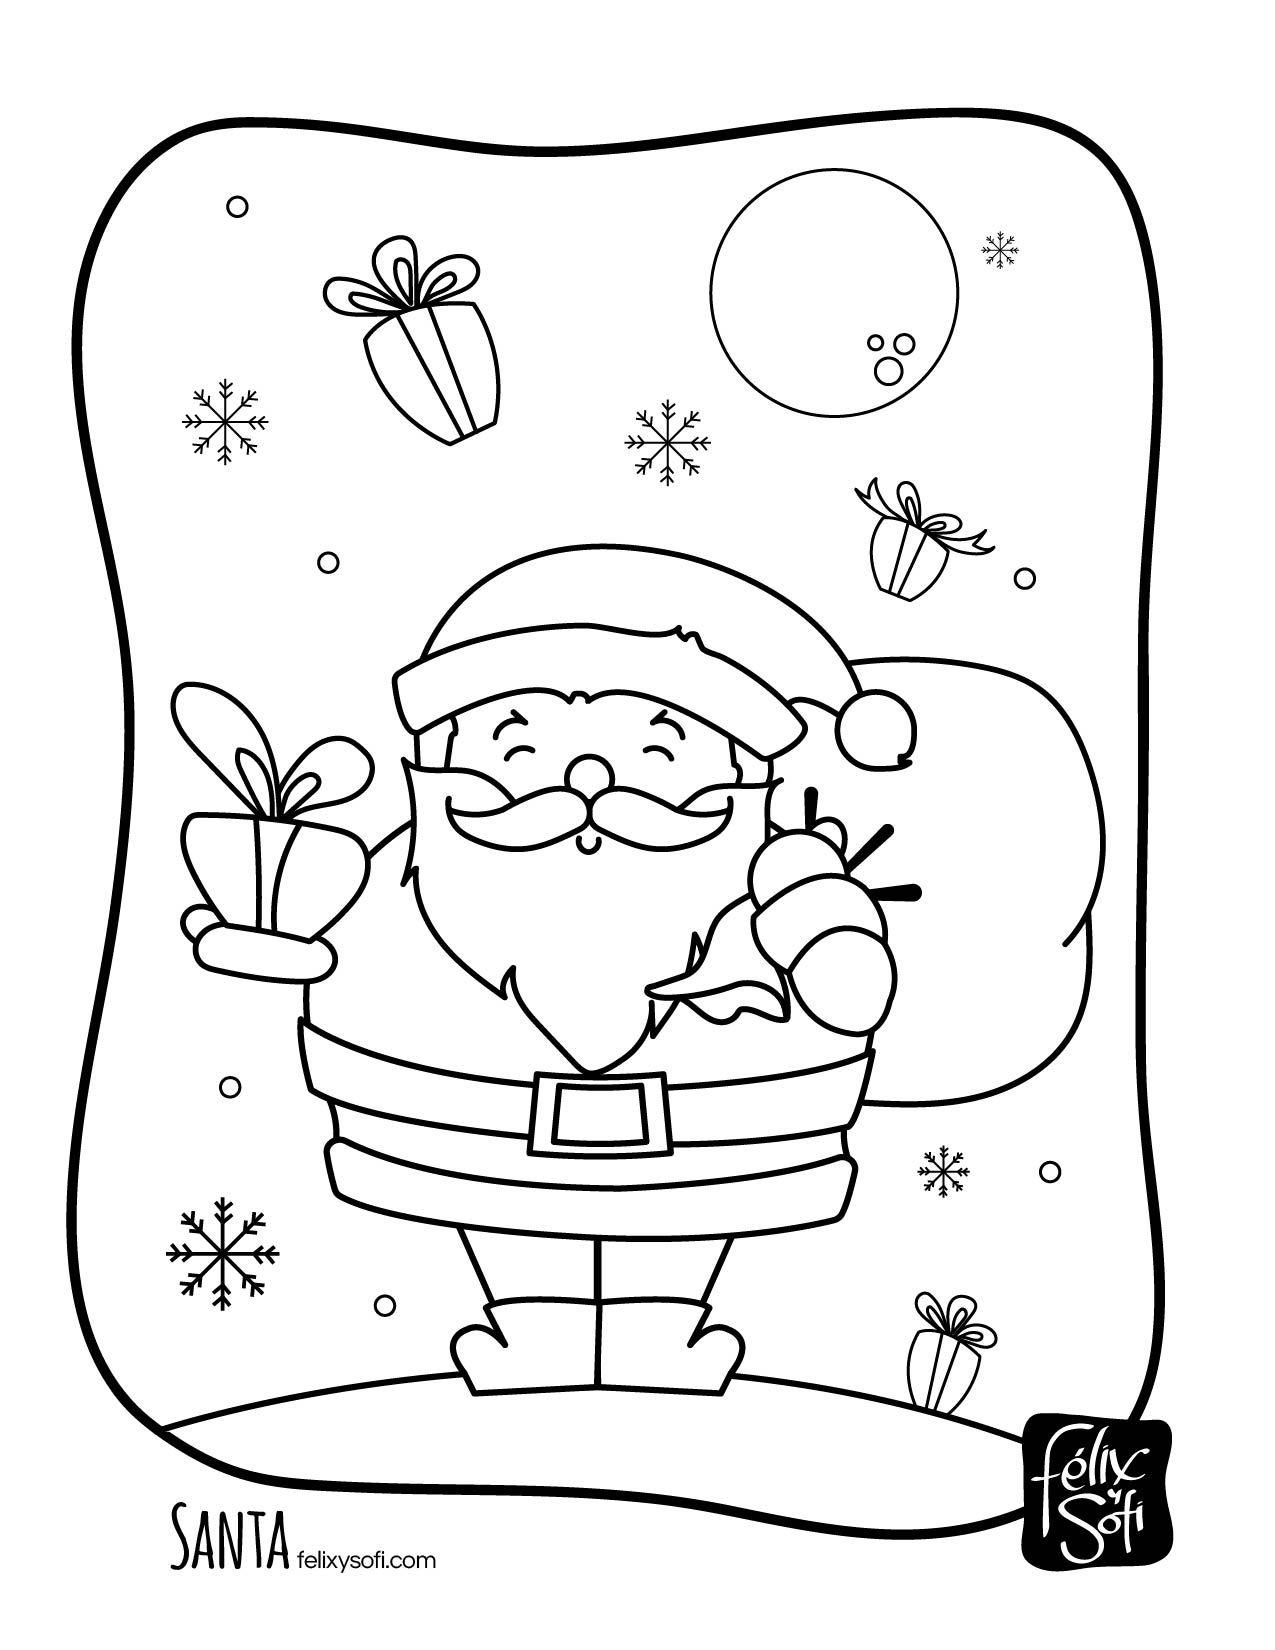 Santa para Colorear Gratis en felixysofi.com #felixysofi #color ...